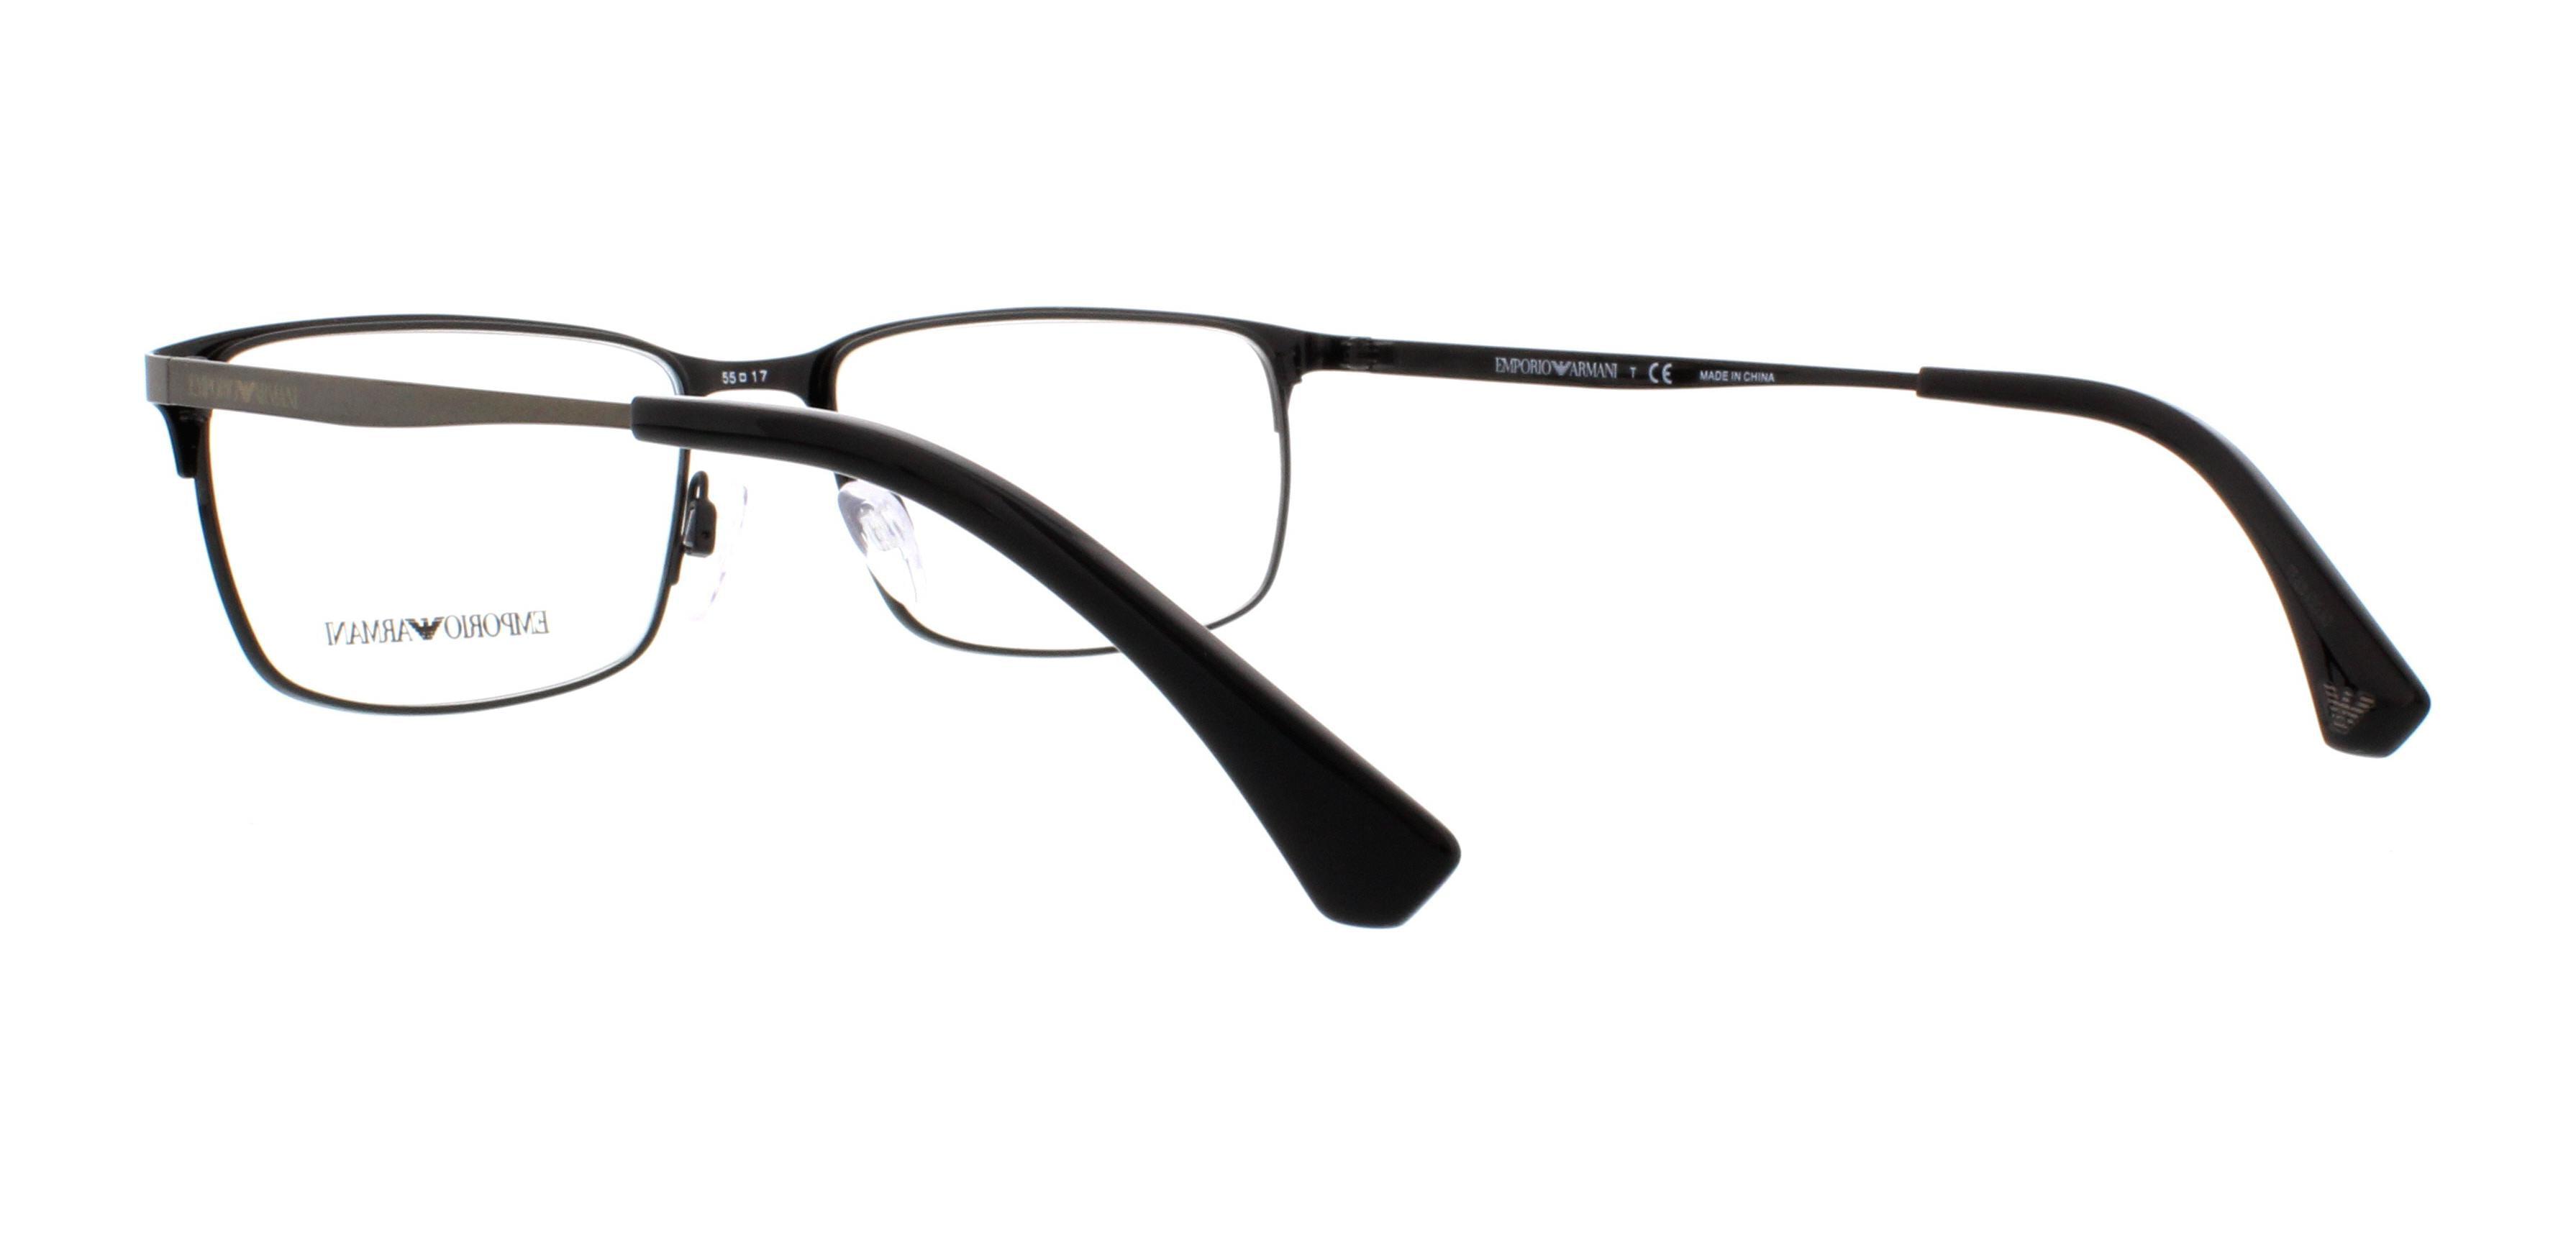 faf9d8034f8 EMPORIO ARMANI Eyeglasses EA 1042 3126 Matte Gunmetal Black Black 55MM -  Walmart.com